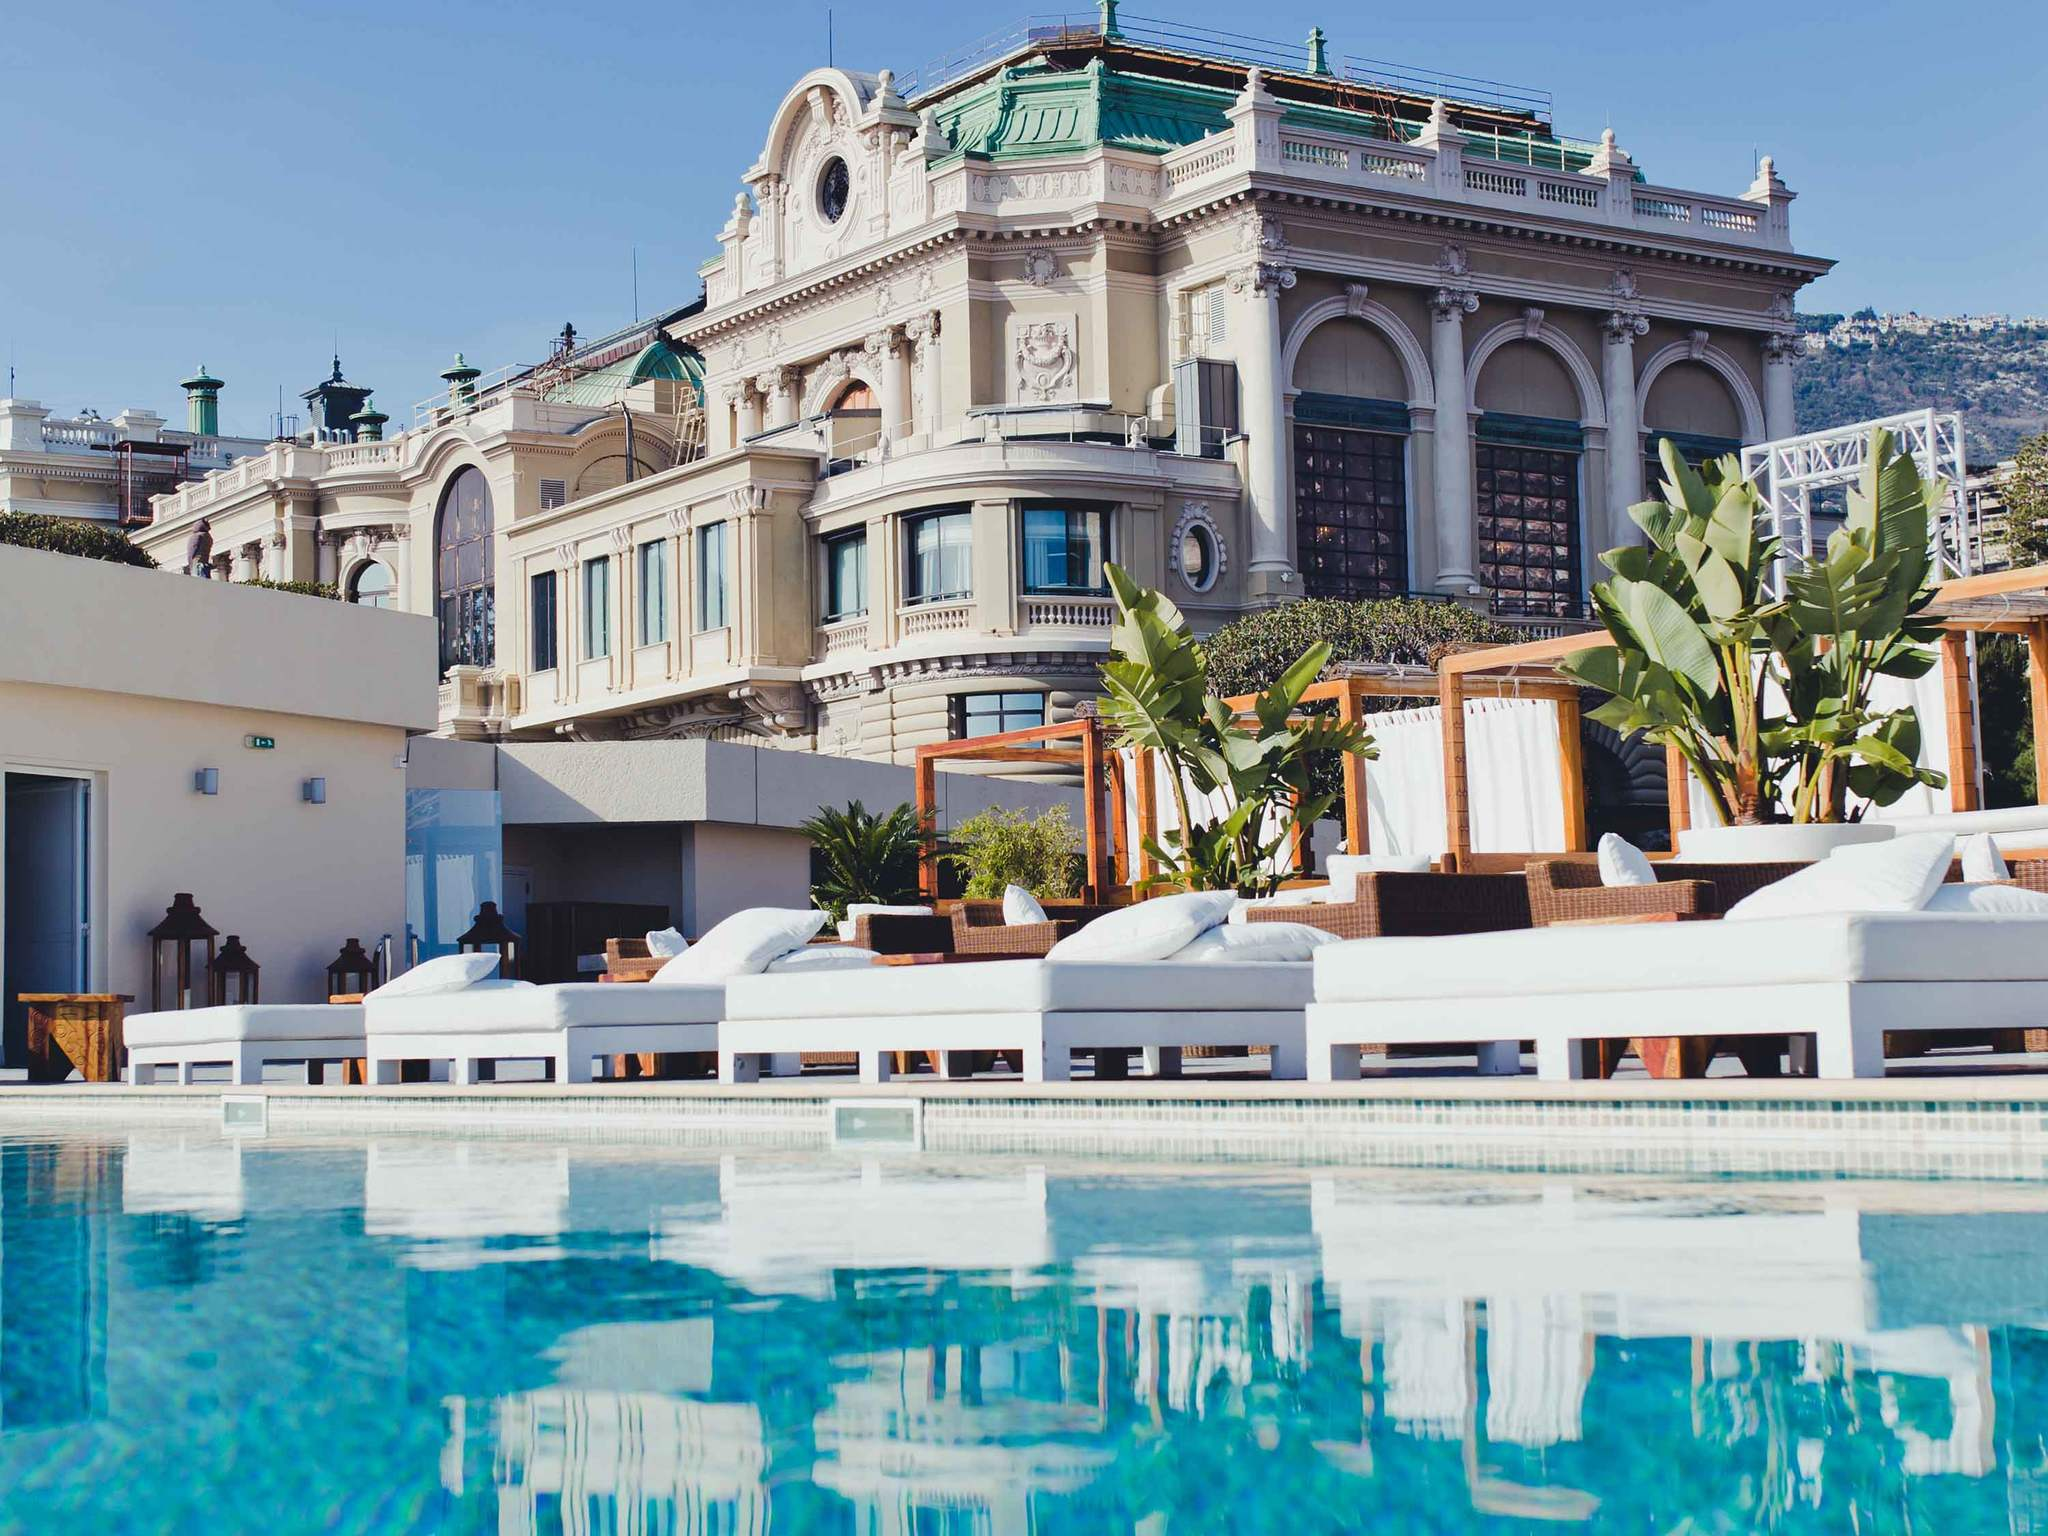 酒店 – Fairmont Monte Carlo 酒店